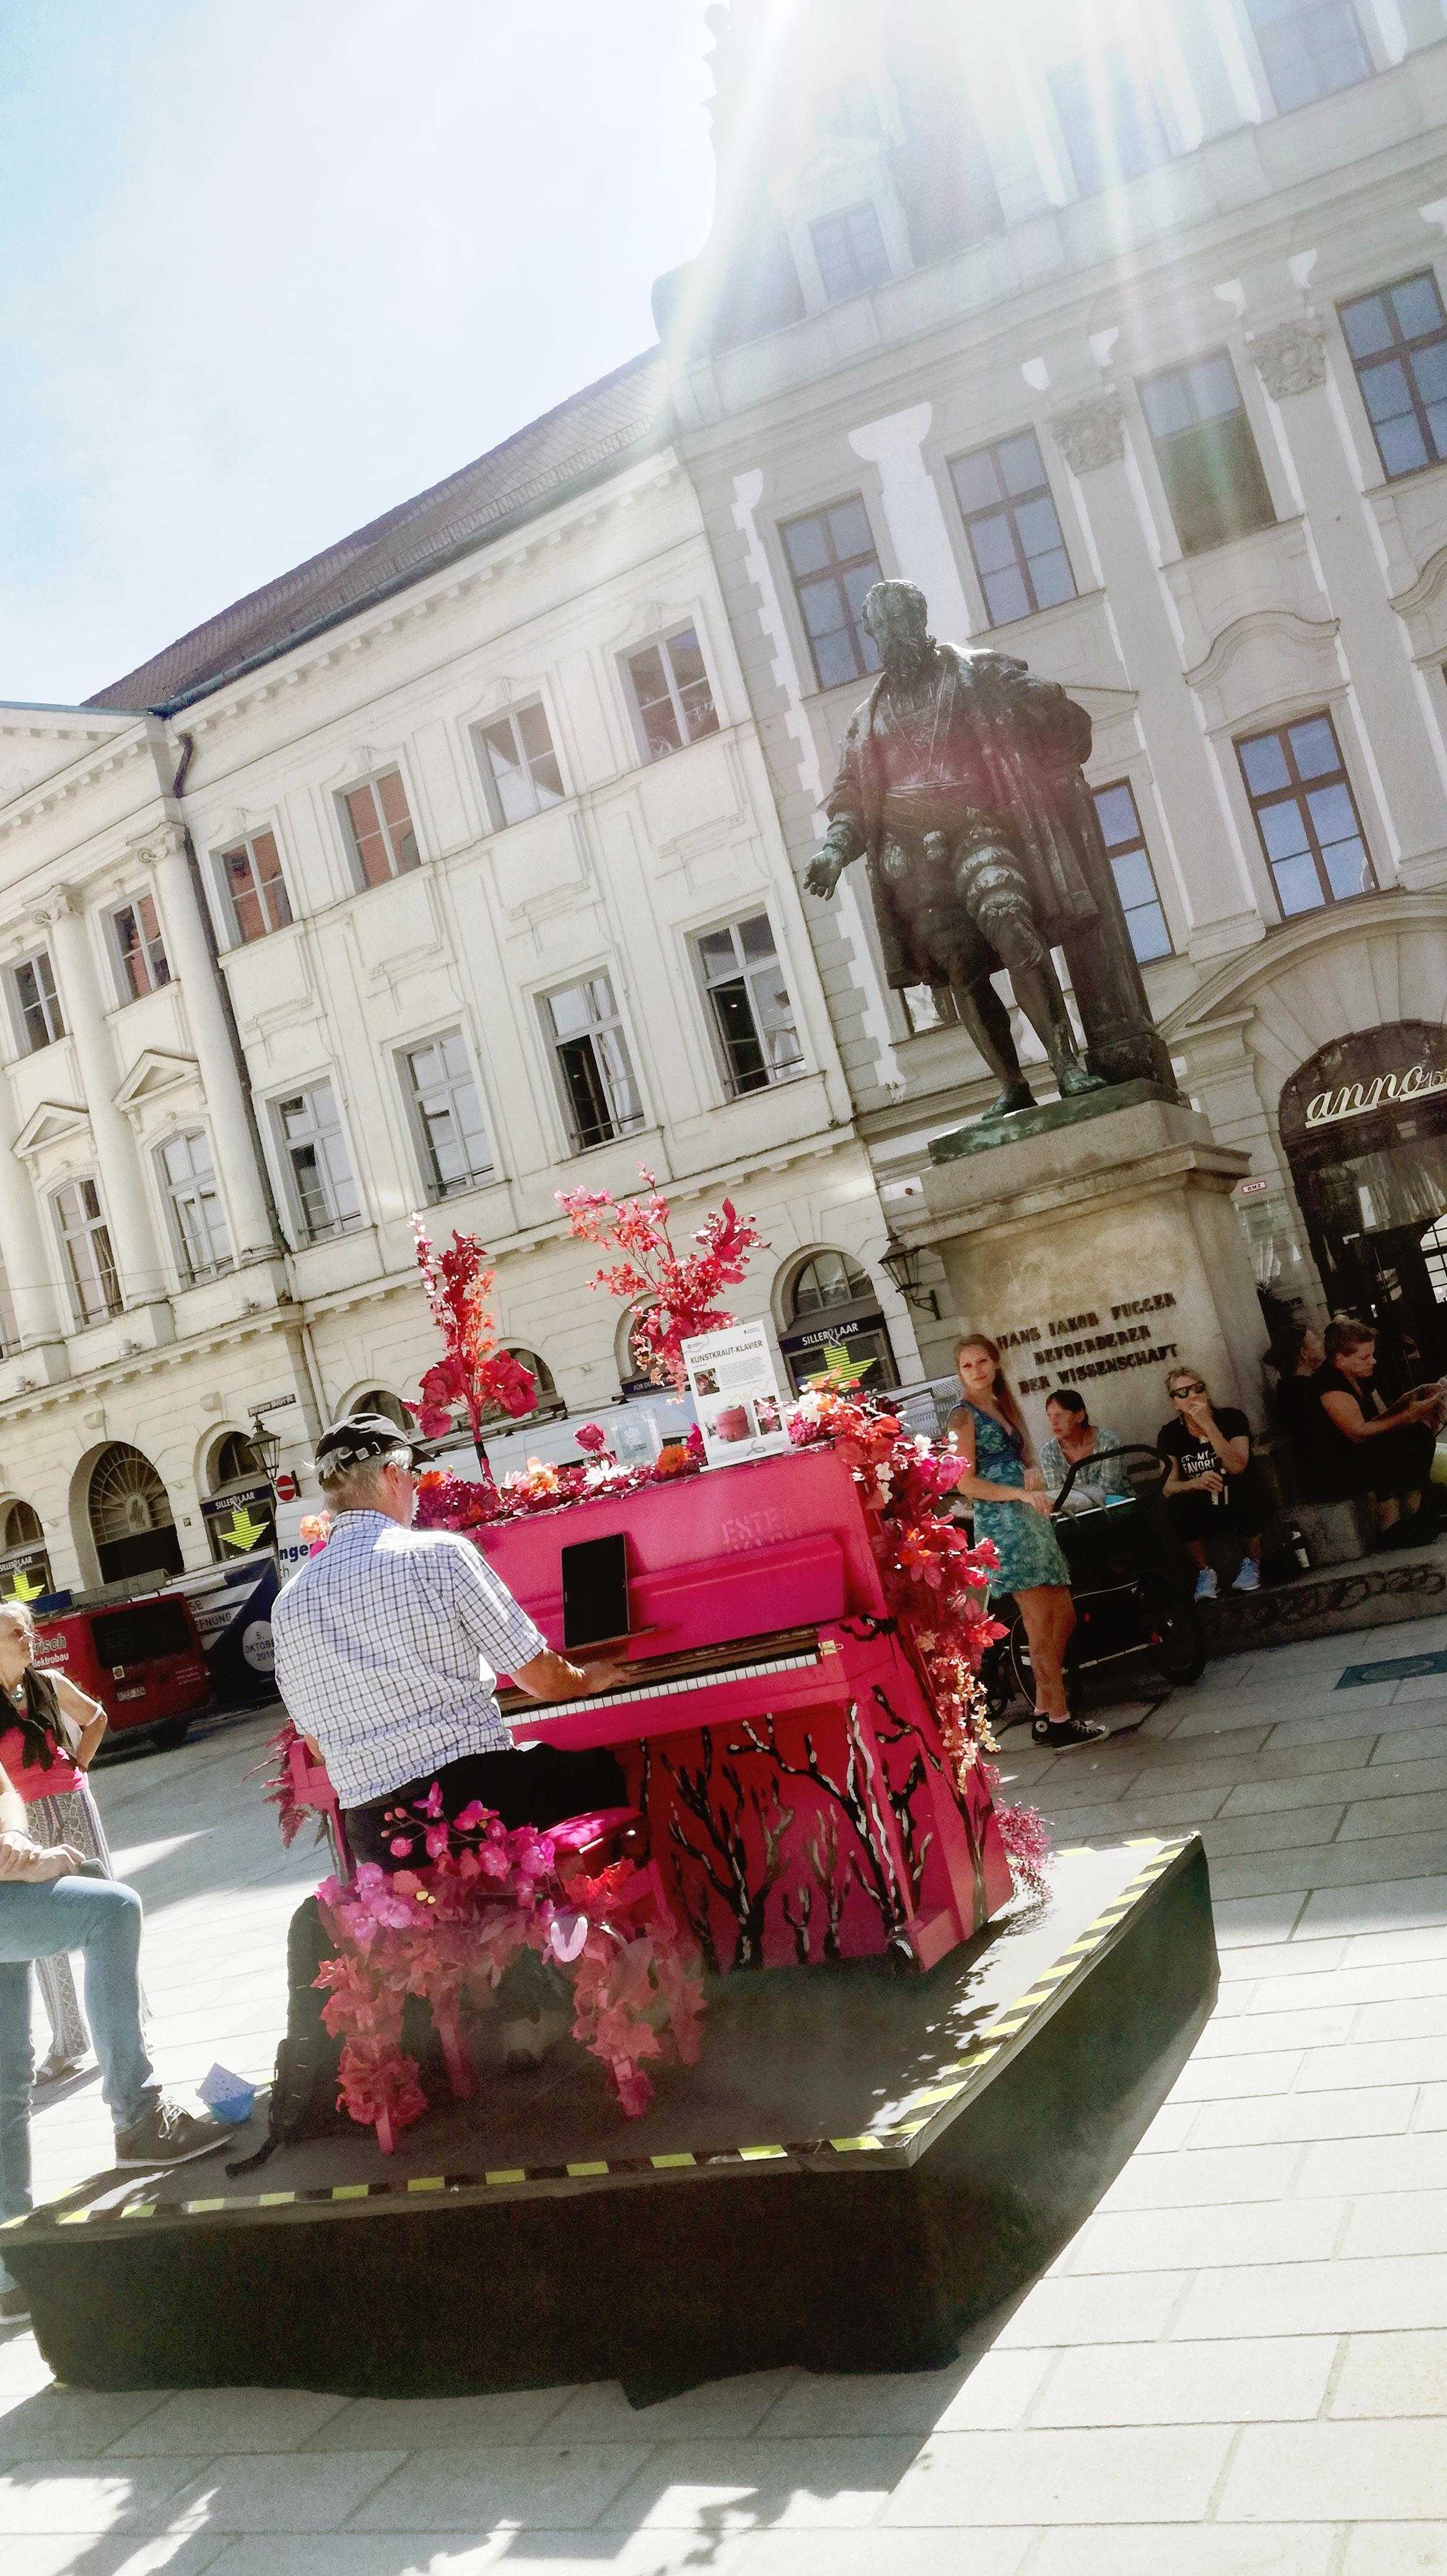 Public Piano an dem jeder Spielen darf  Johannes Ulrich Gehrke